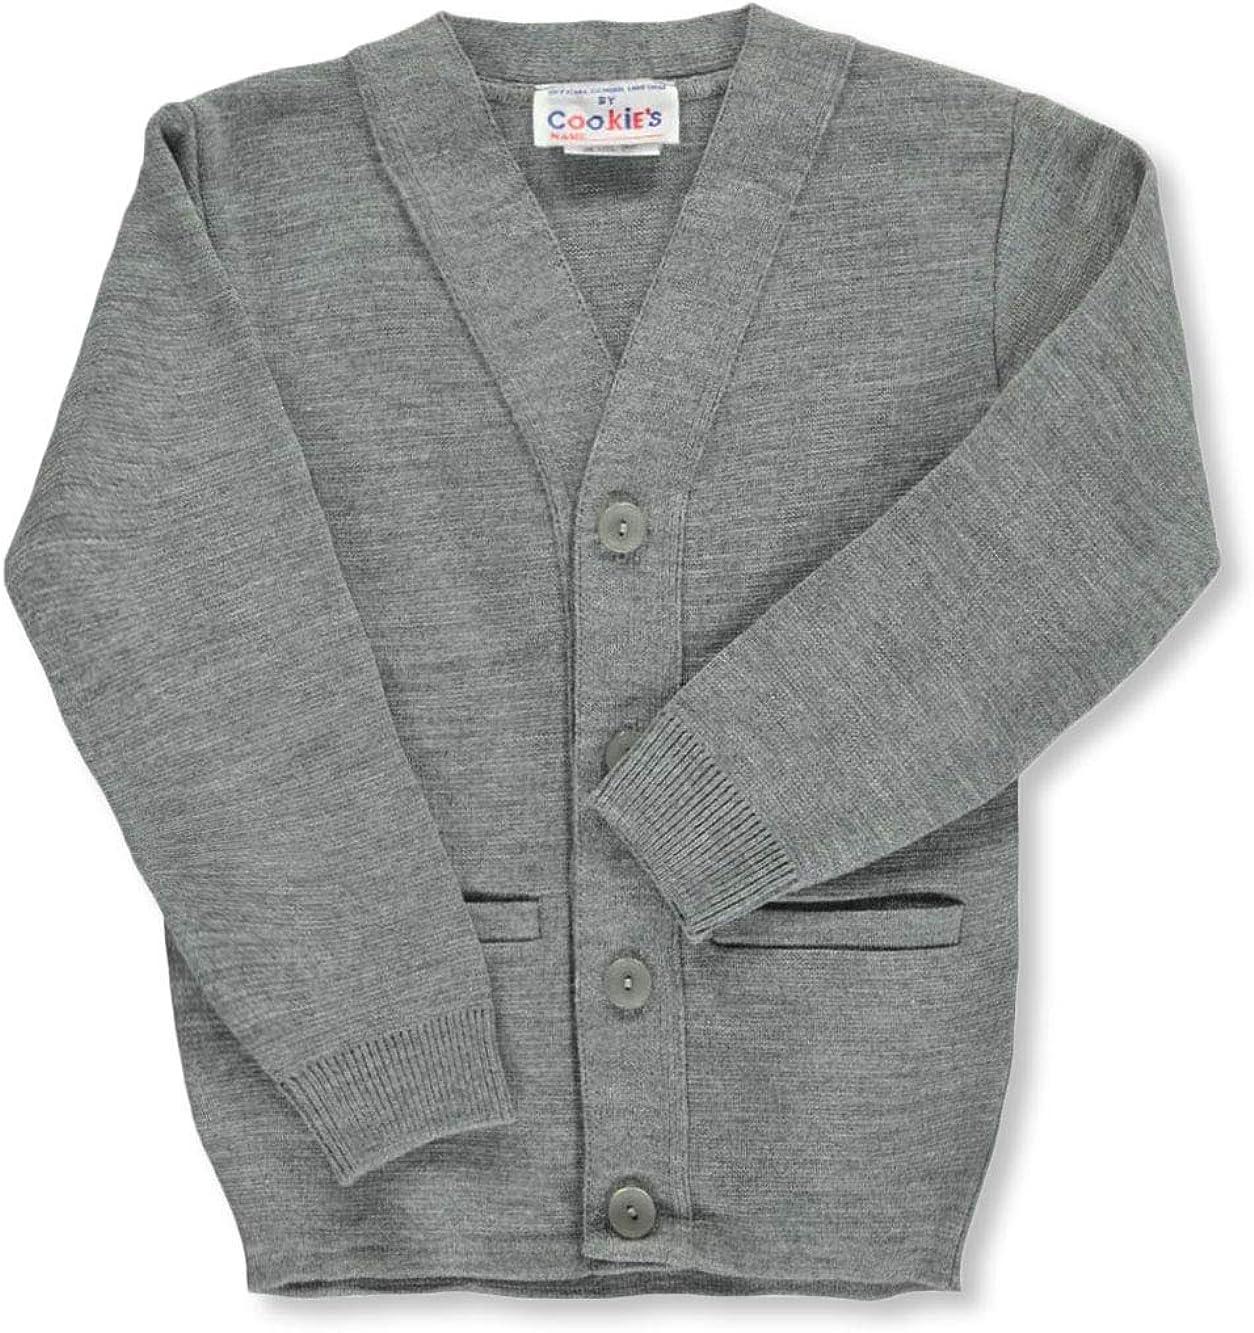 Gray 8 Cookies Brand Big Boys Cardigan Sweater